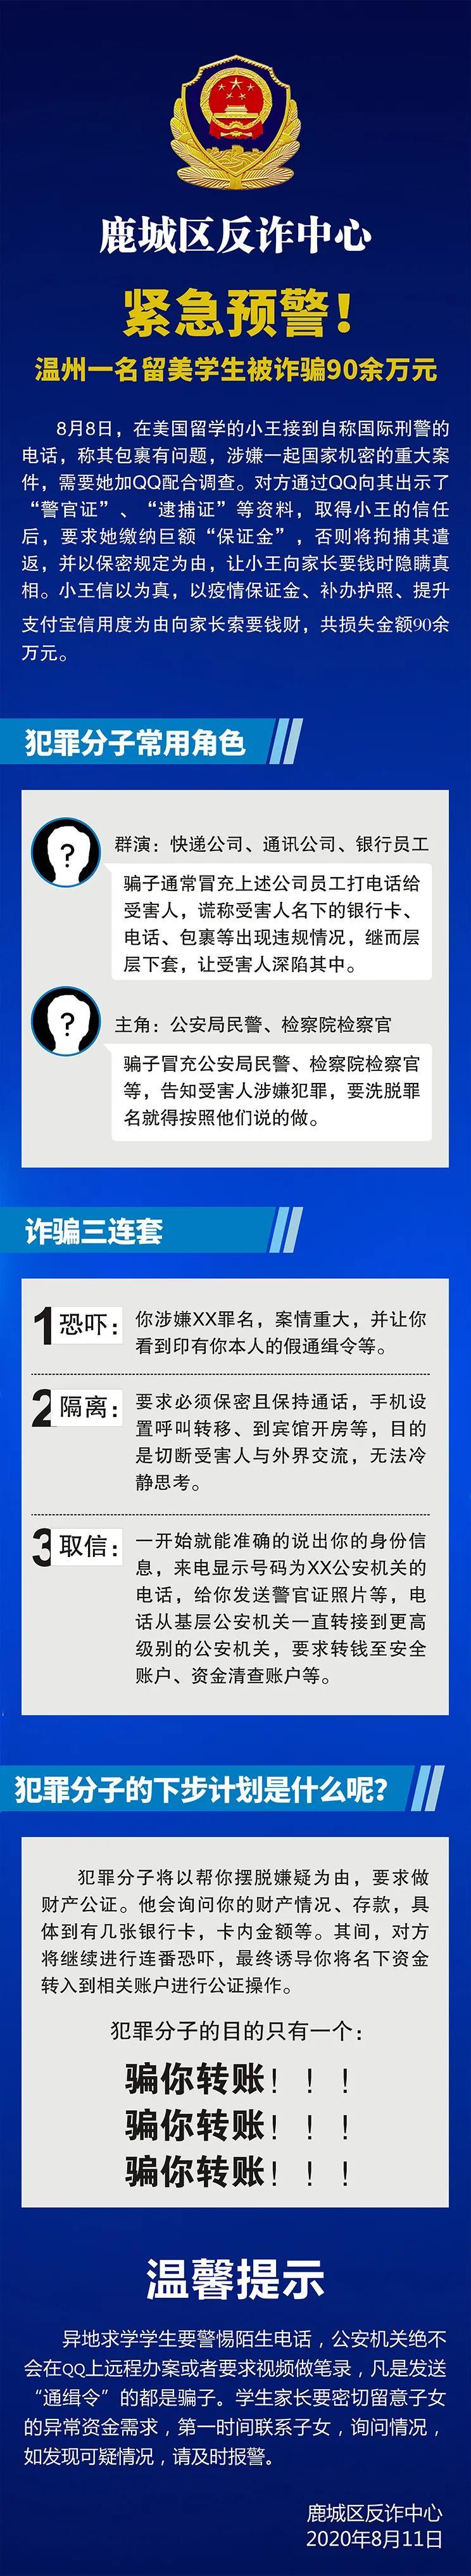 "【google分析】_温州警方:在美留学生被以""涉案将遣返""诈骗损失近百万"